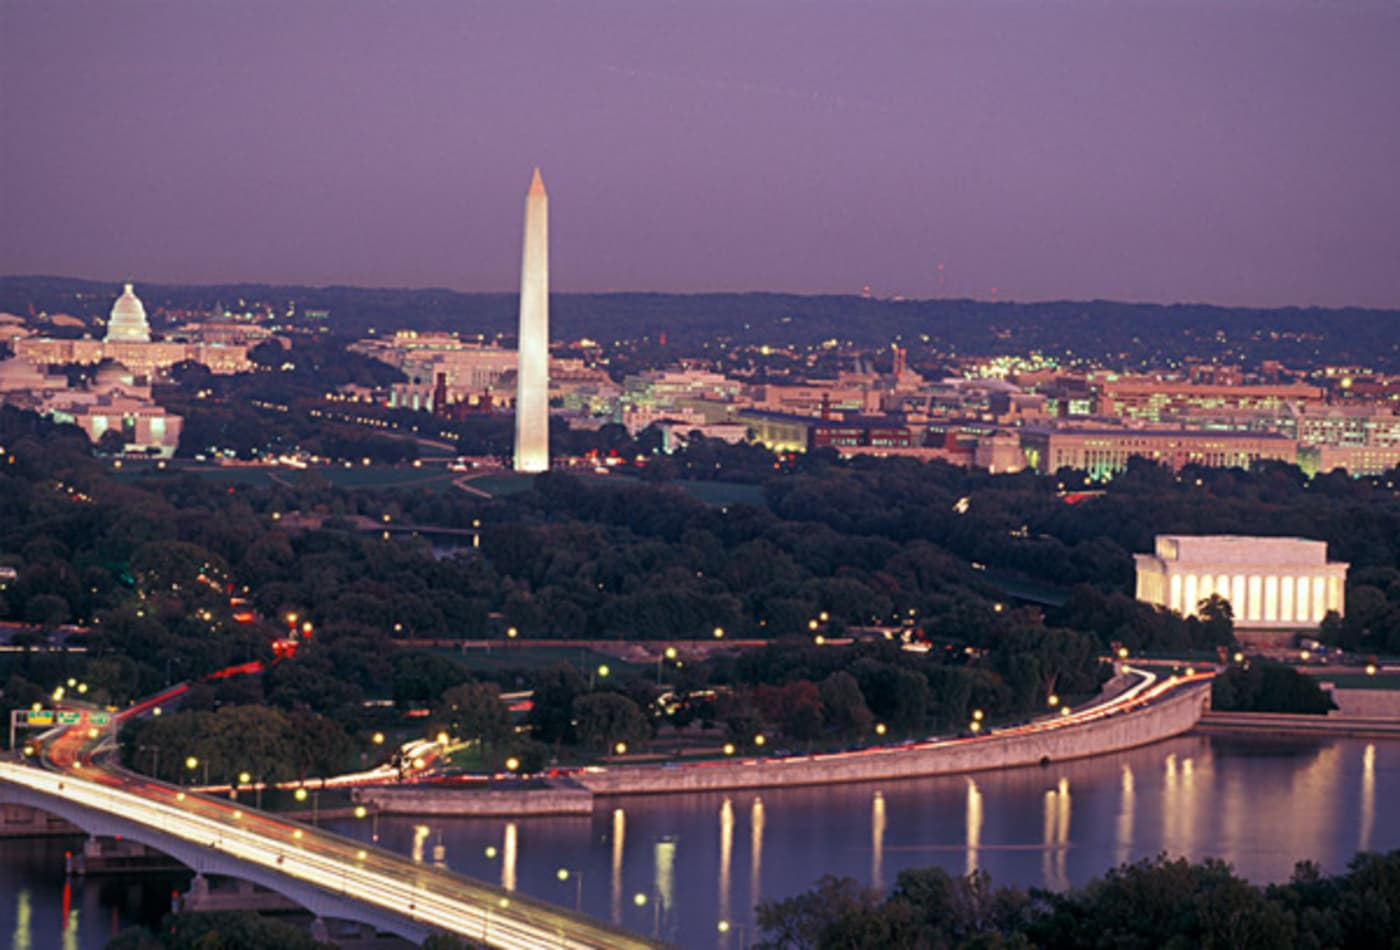 US-cities-where-homes-sell-the-fastest-washington-dc.jpg